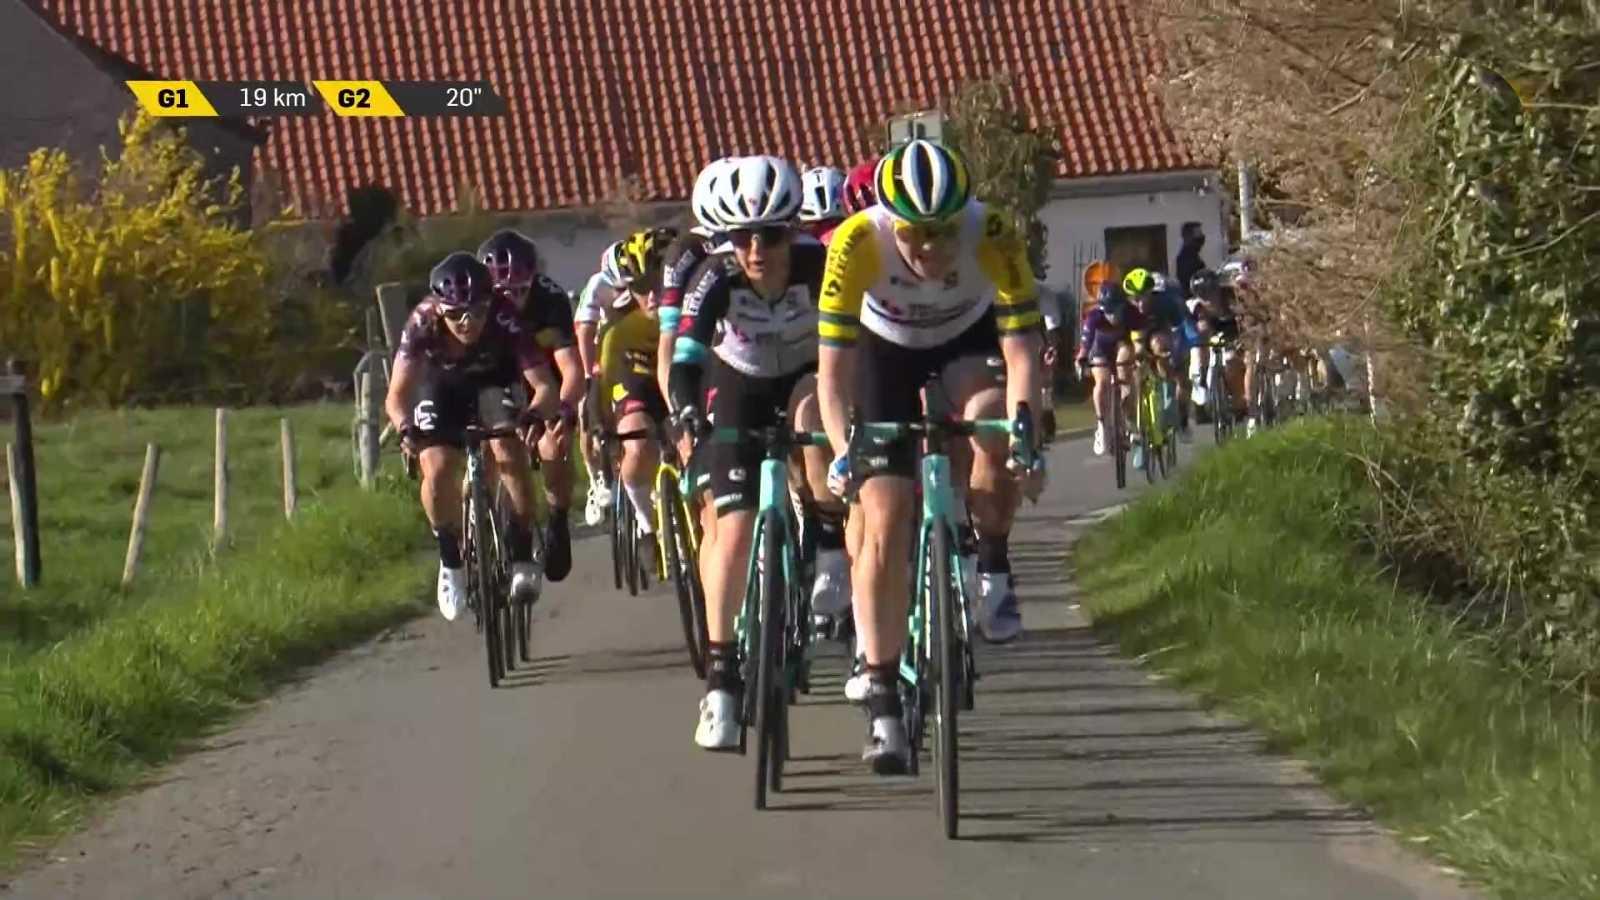 Ciclismo - Tour de Flandes. Carrera femenina - ver ahora